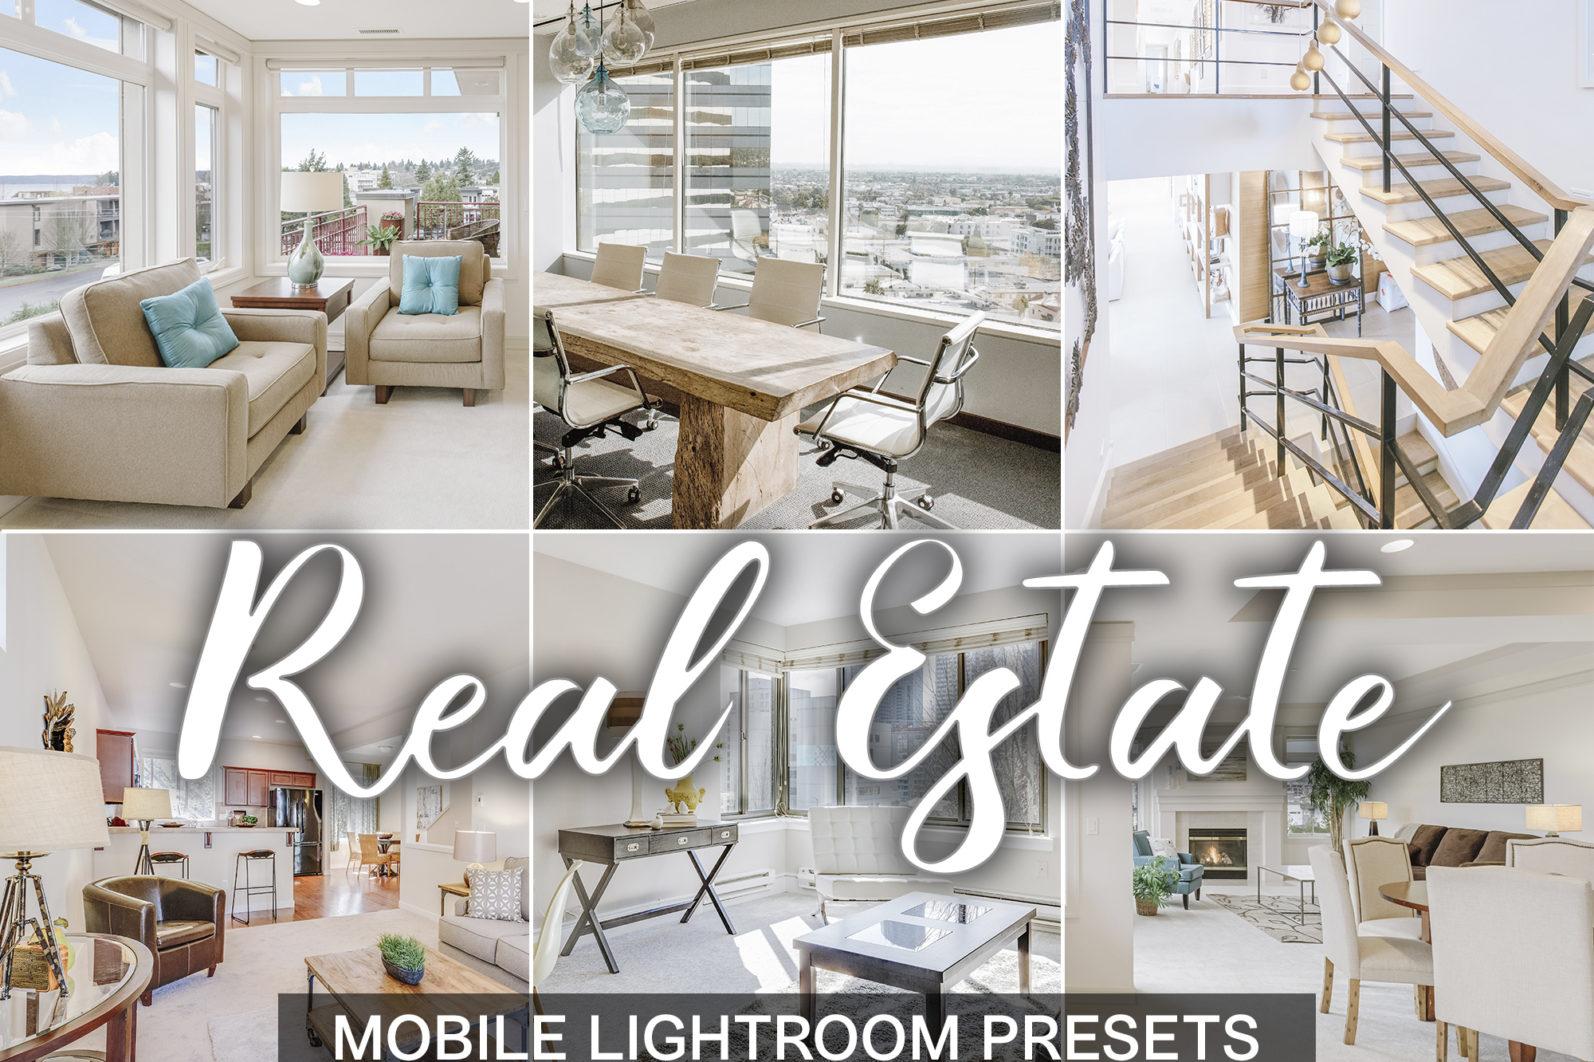 15 Mobile Lightroom Presets REAL ESTATE - Real Estate presets cover product -